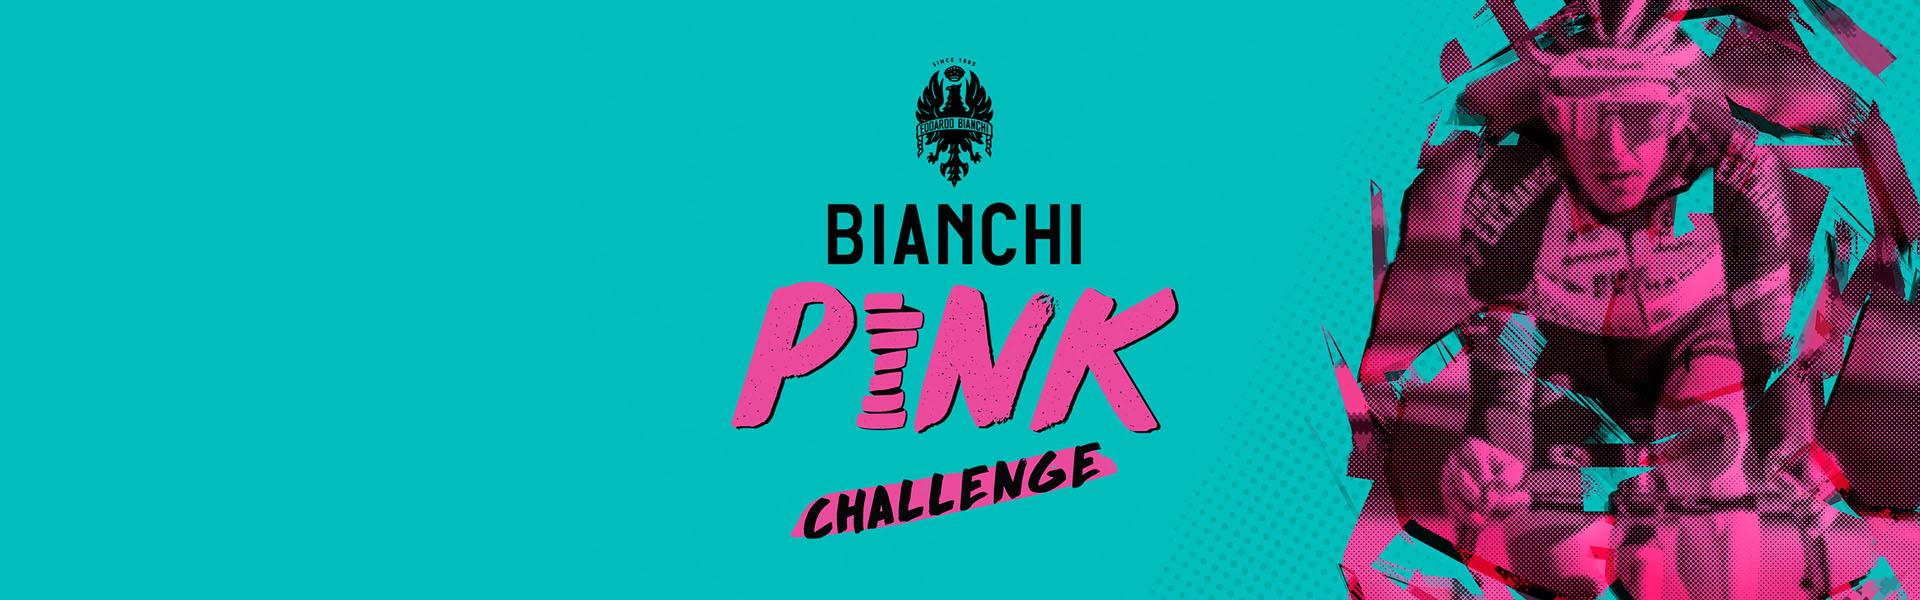 Bianchi PINK challenge -az igazi kihívás!